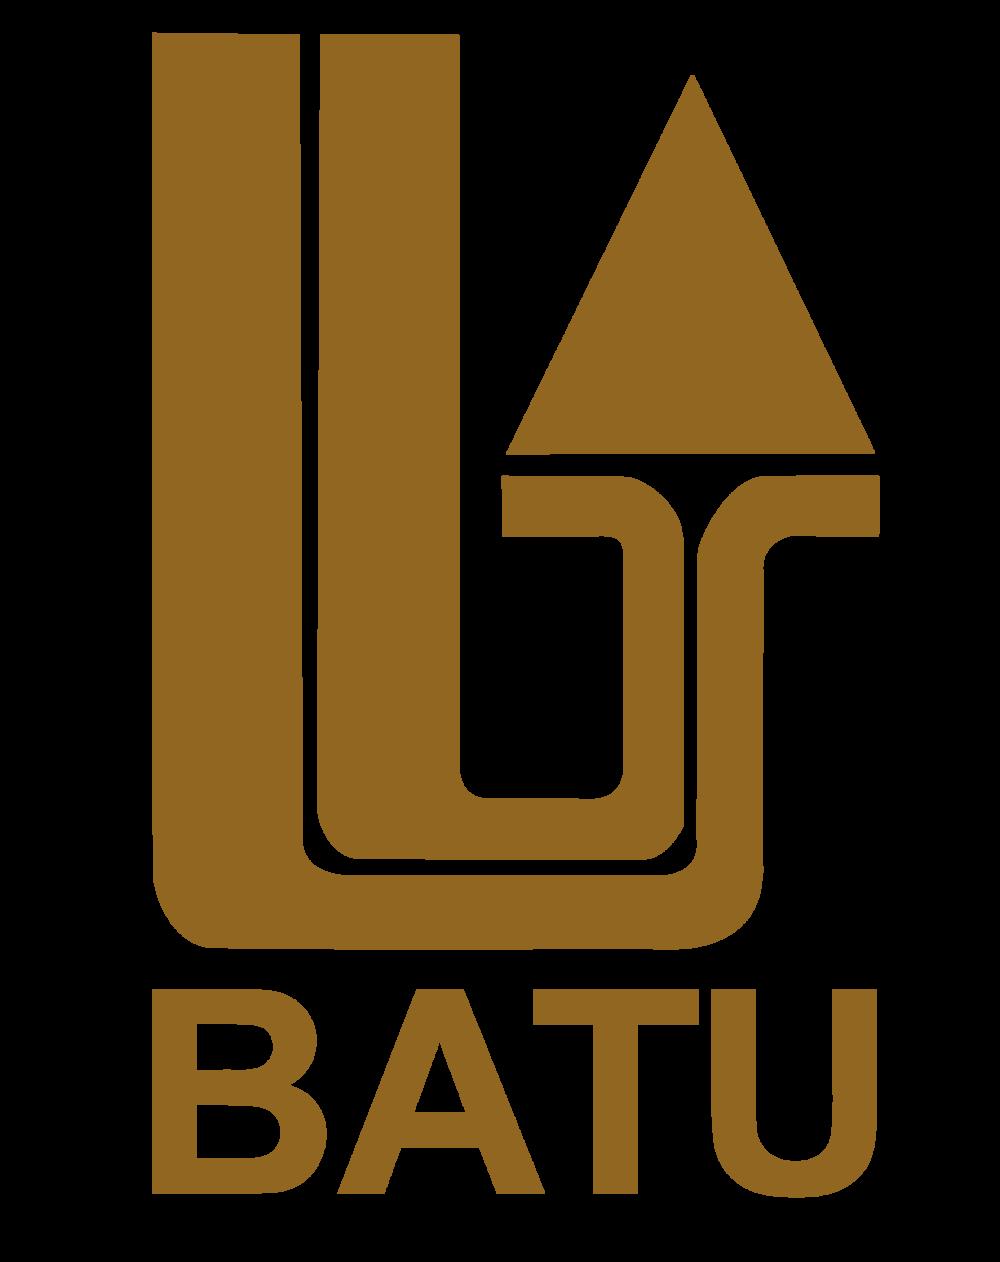 High Res BATU logo 2.png